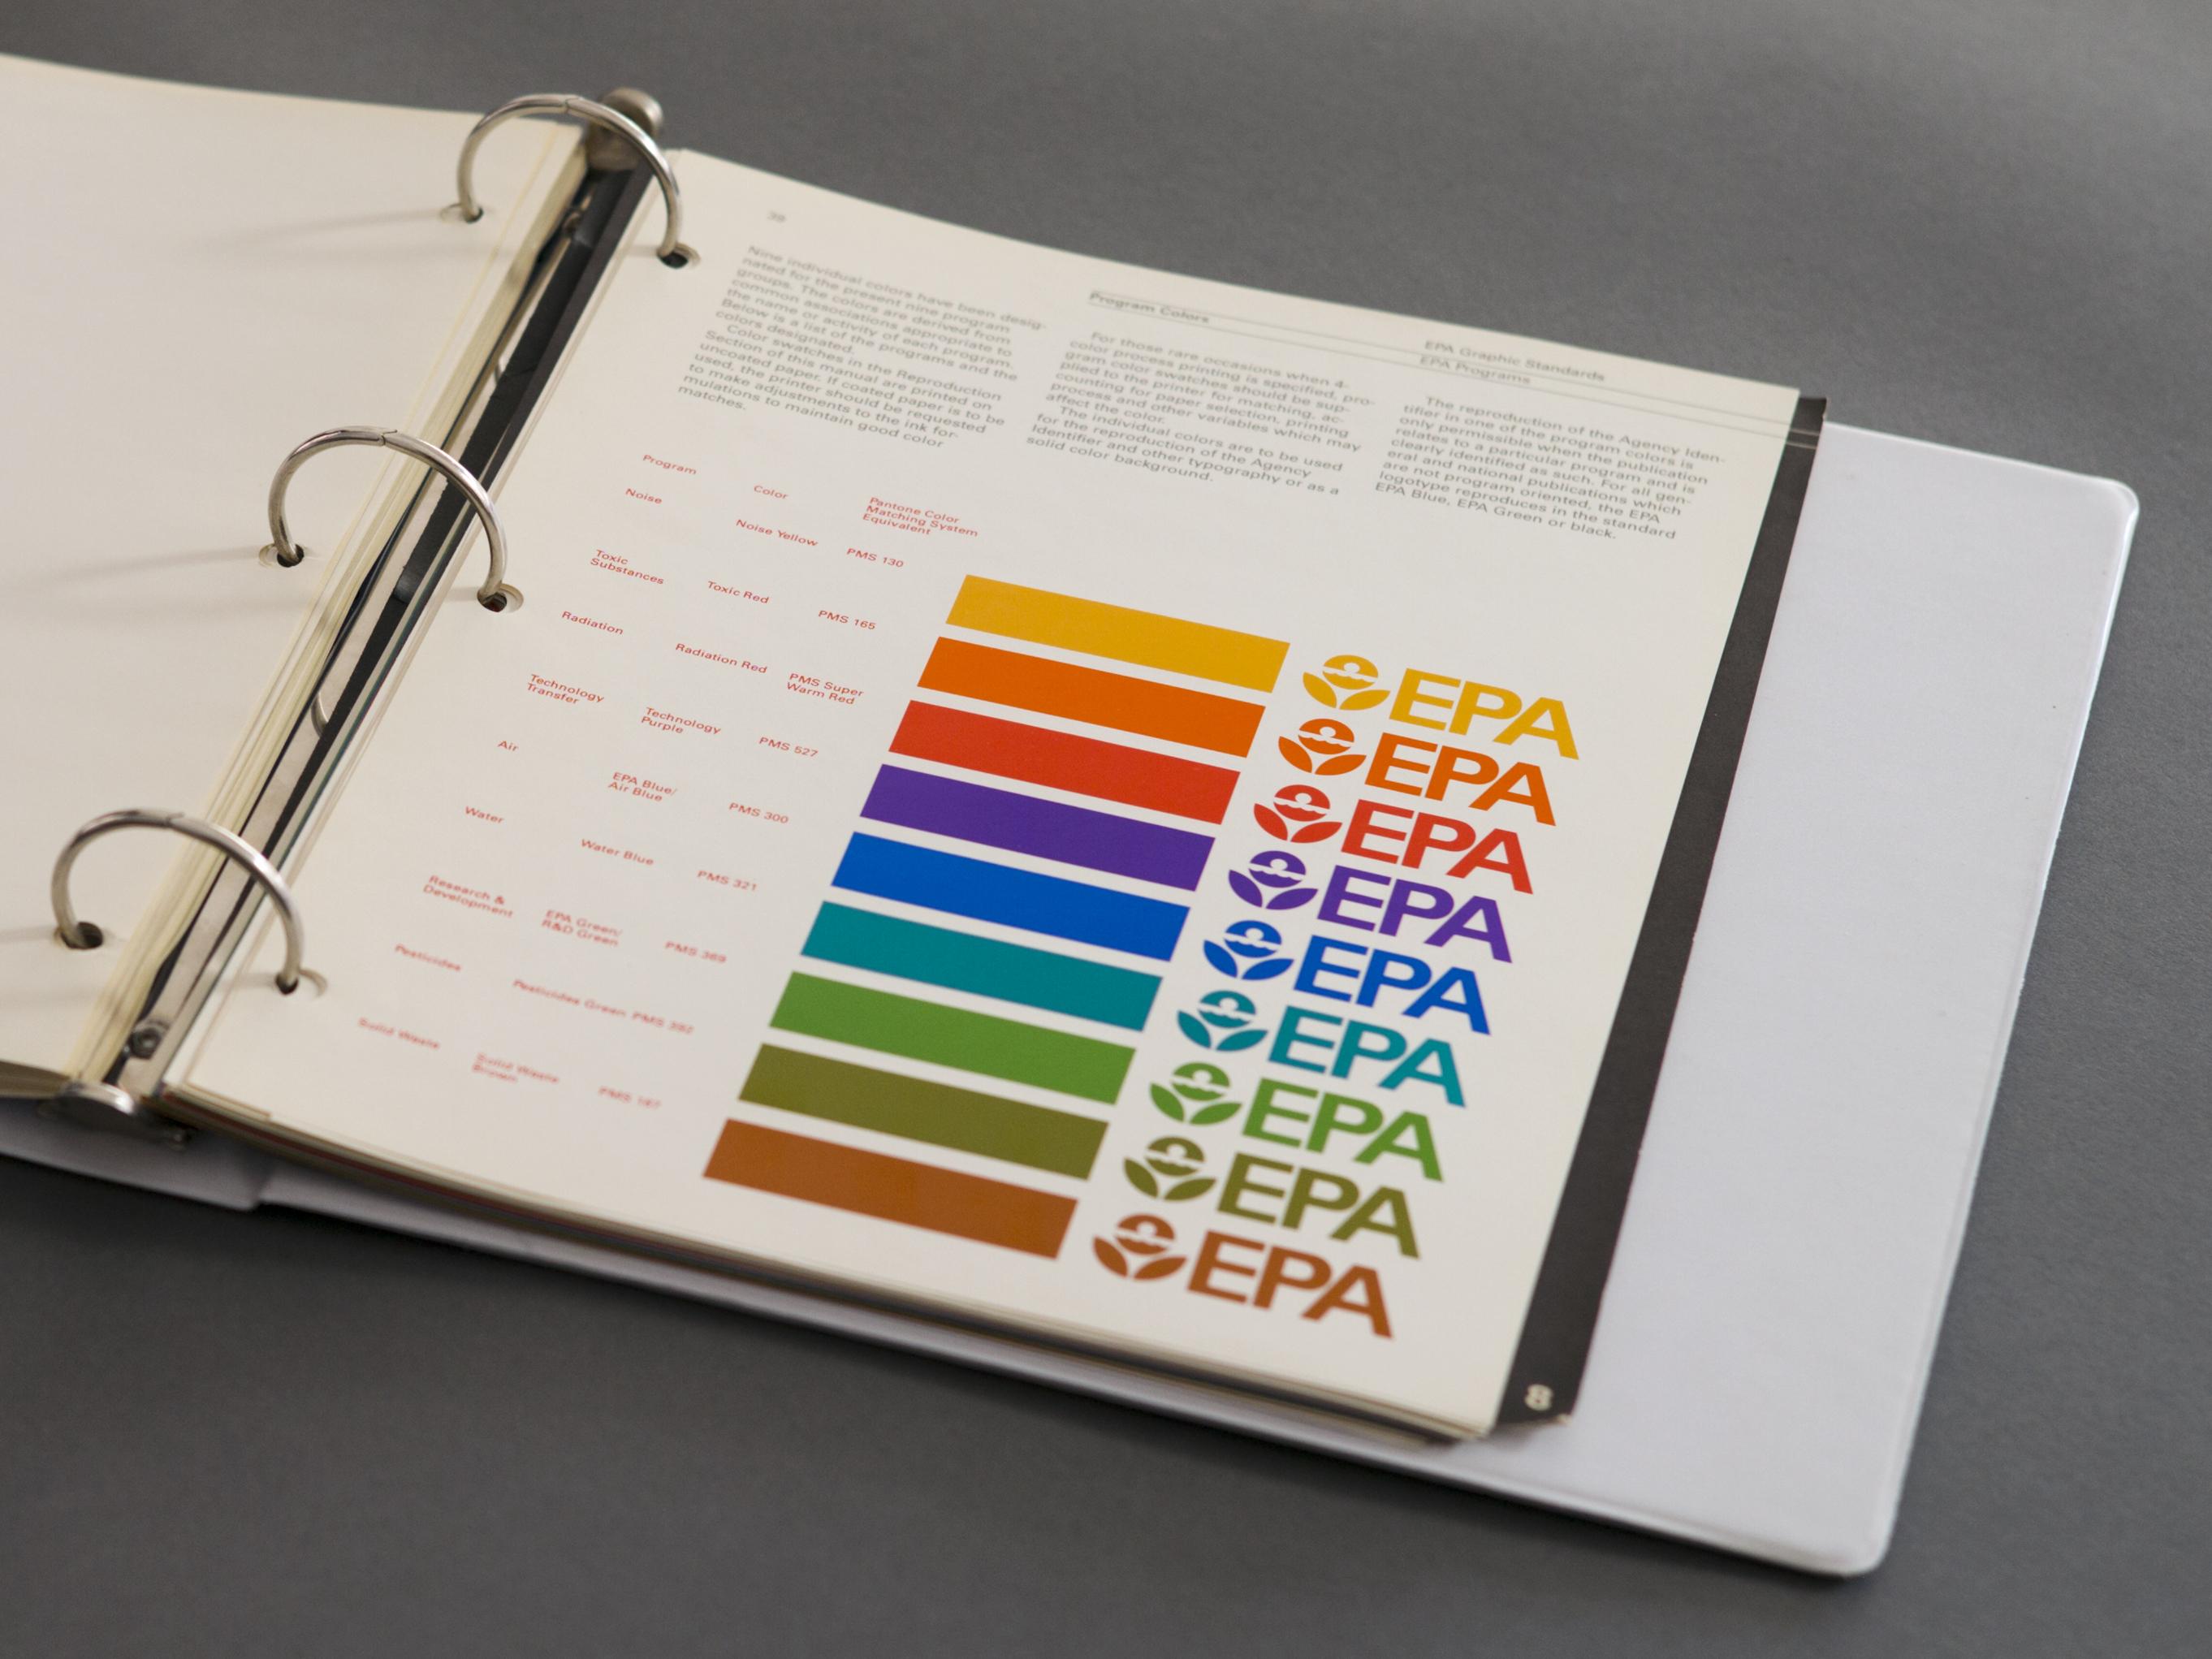 Epa  Nasa  Ibm Graphic Design Manuals Are Newly Popular As